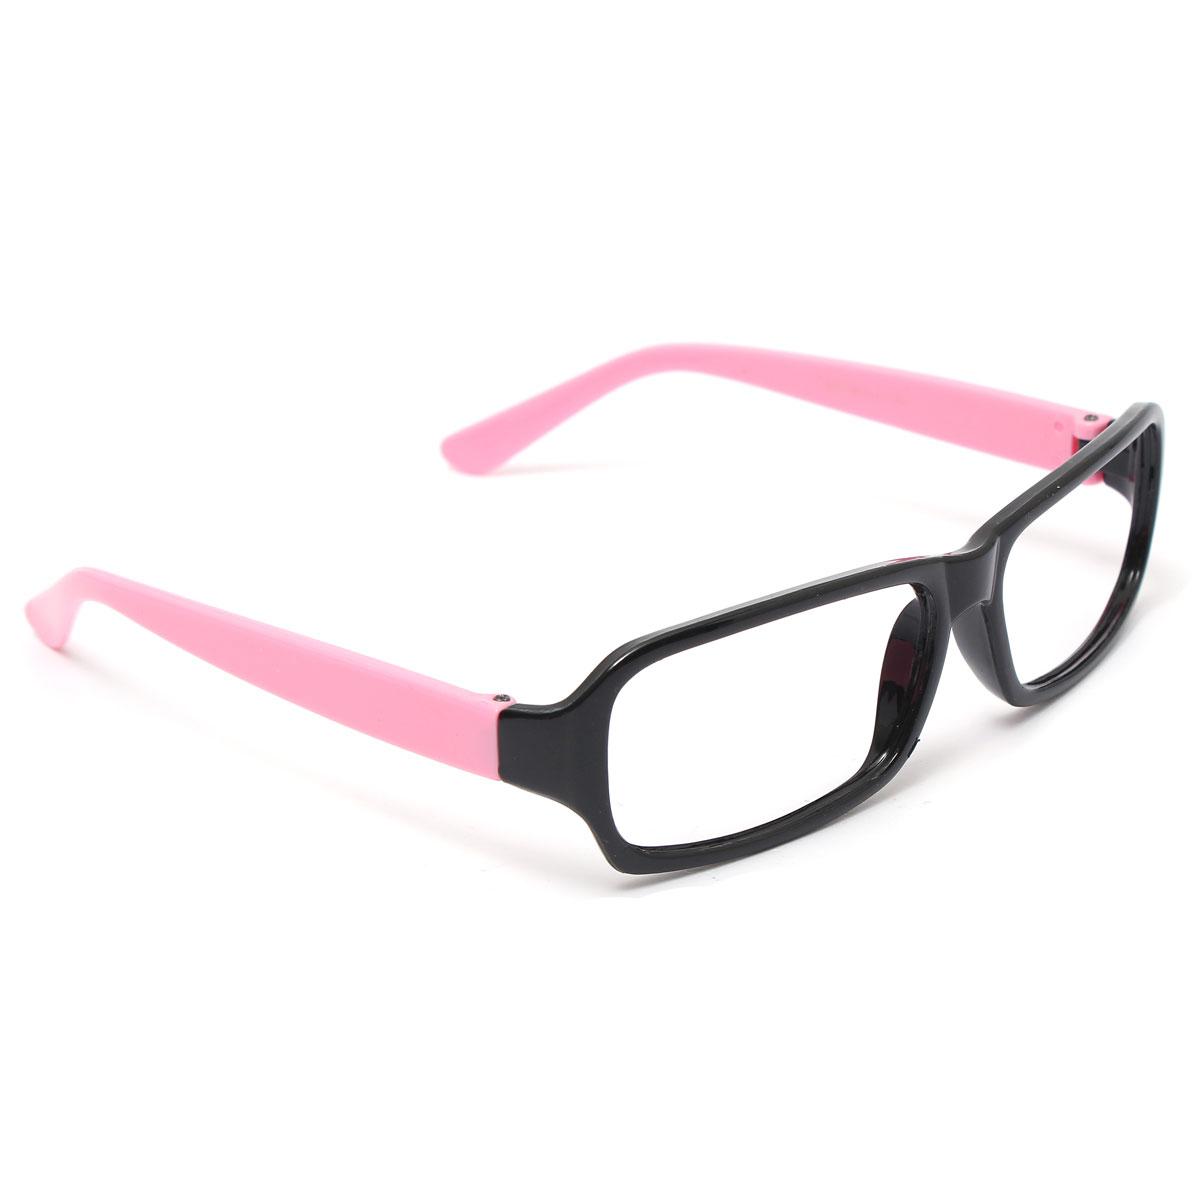 Eyeglass Frames No Lenses : Children Kids Girls Unisex Anti-fatigue Goggles Games ...